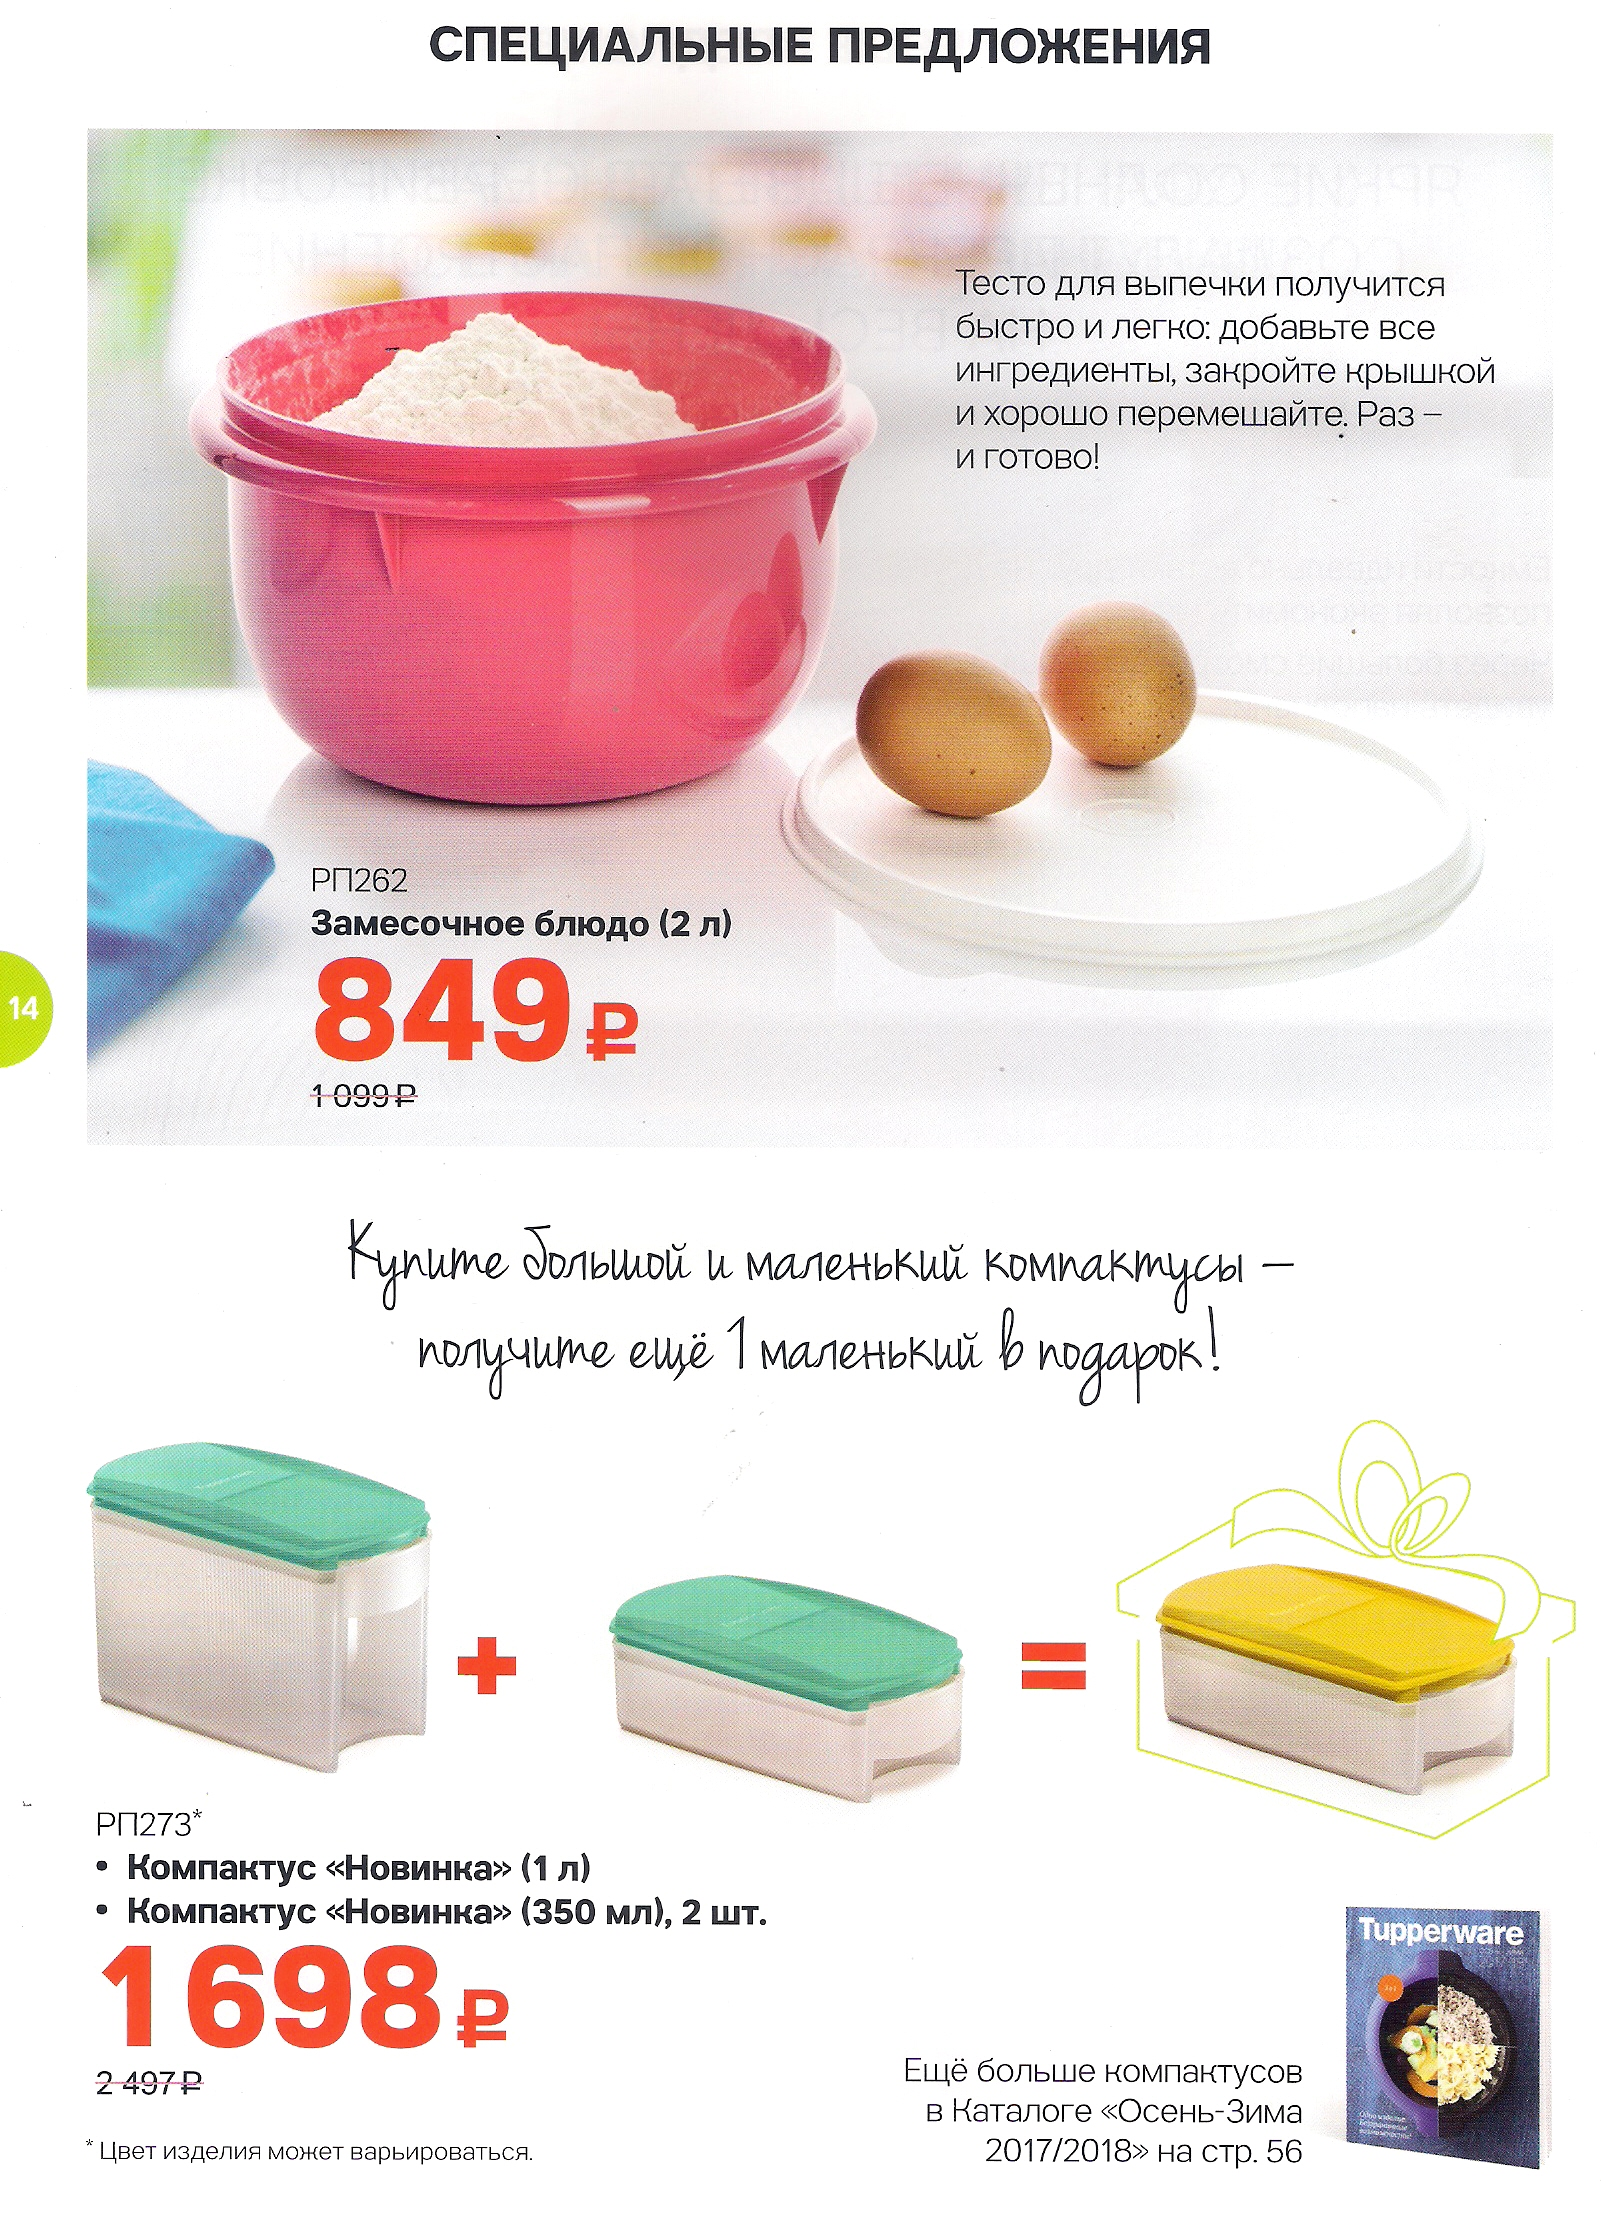 https://tupperware-online.ru/images/upload/13о.jpg